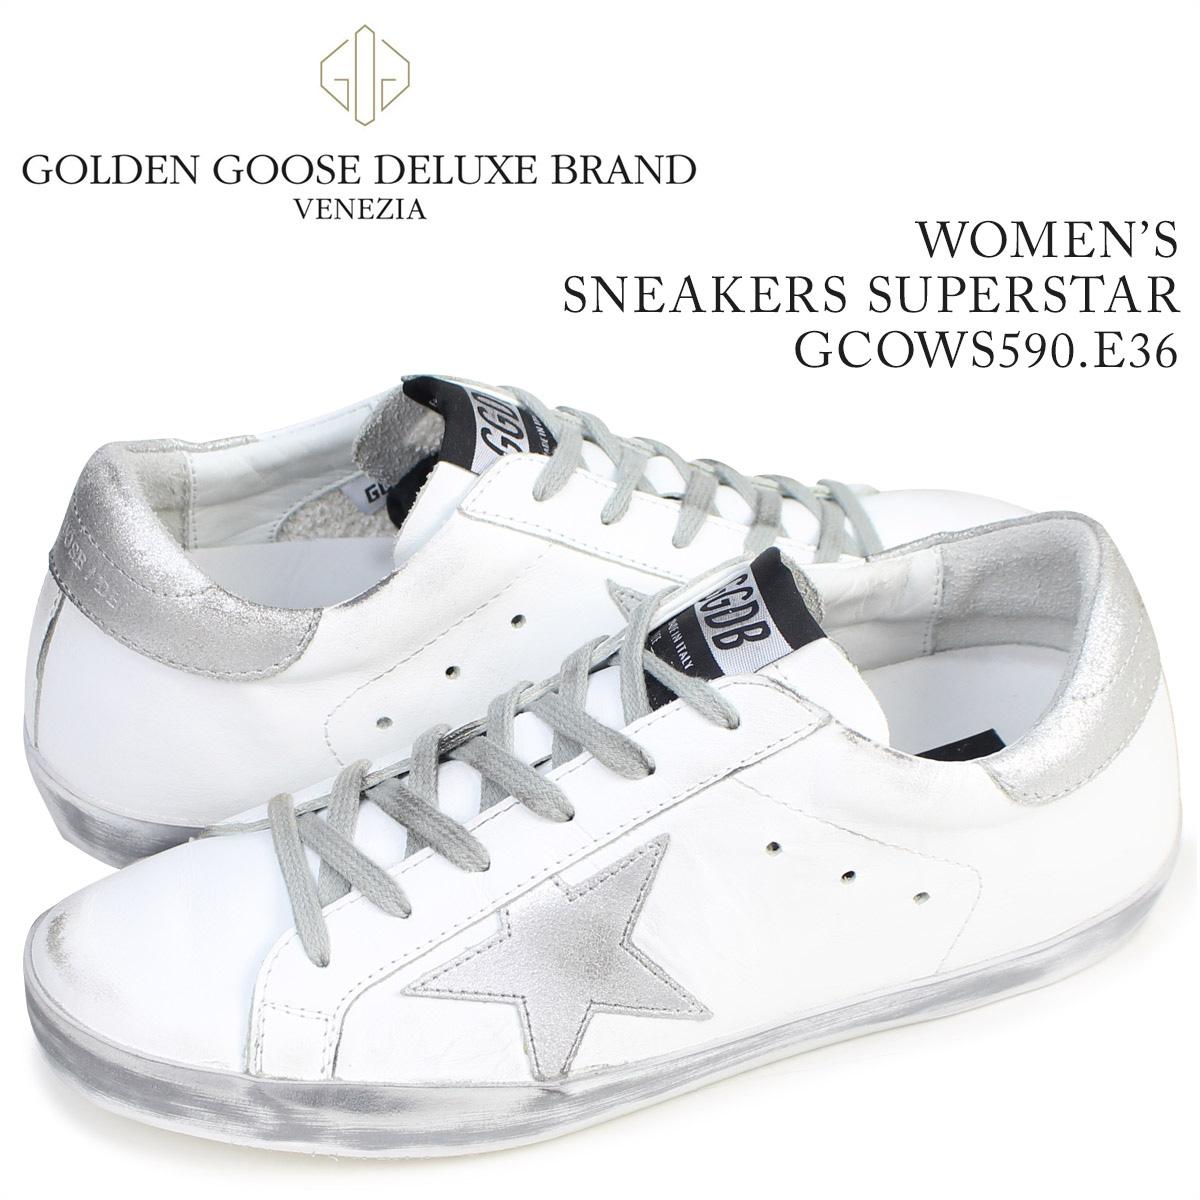 Golden Goose ゴールデングース スニーカー レディース スーパースター SNEAKERS SUPERSTAR イタリア製 GCOWS590 E36 靴 ホワイト 白 [3/4 再入荷]